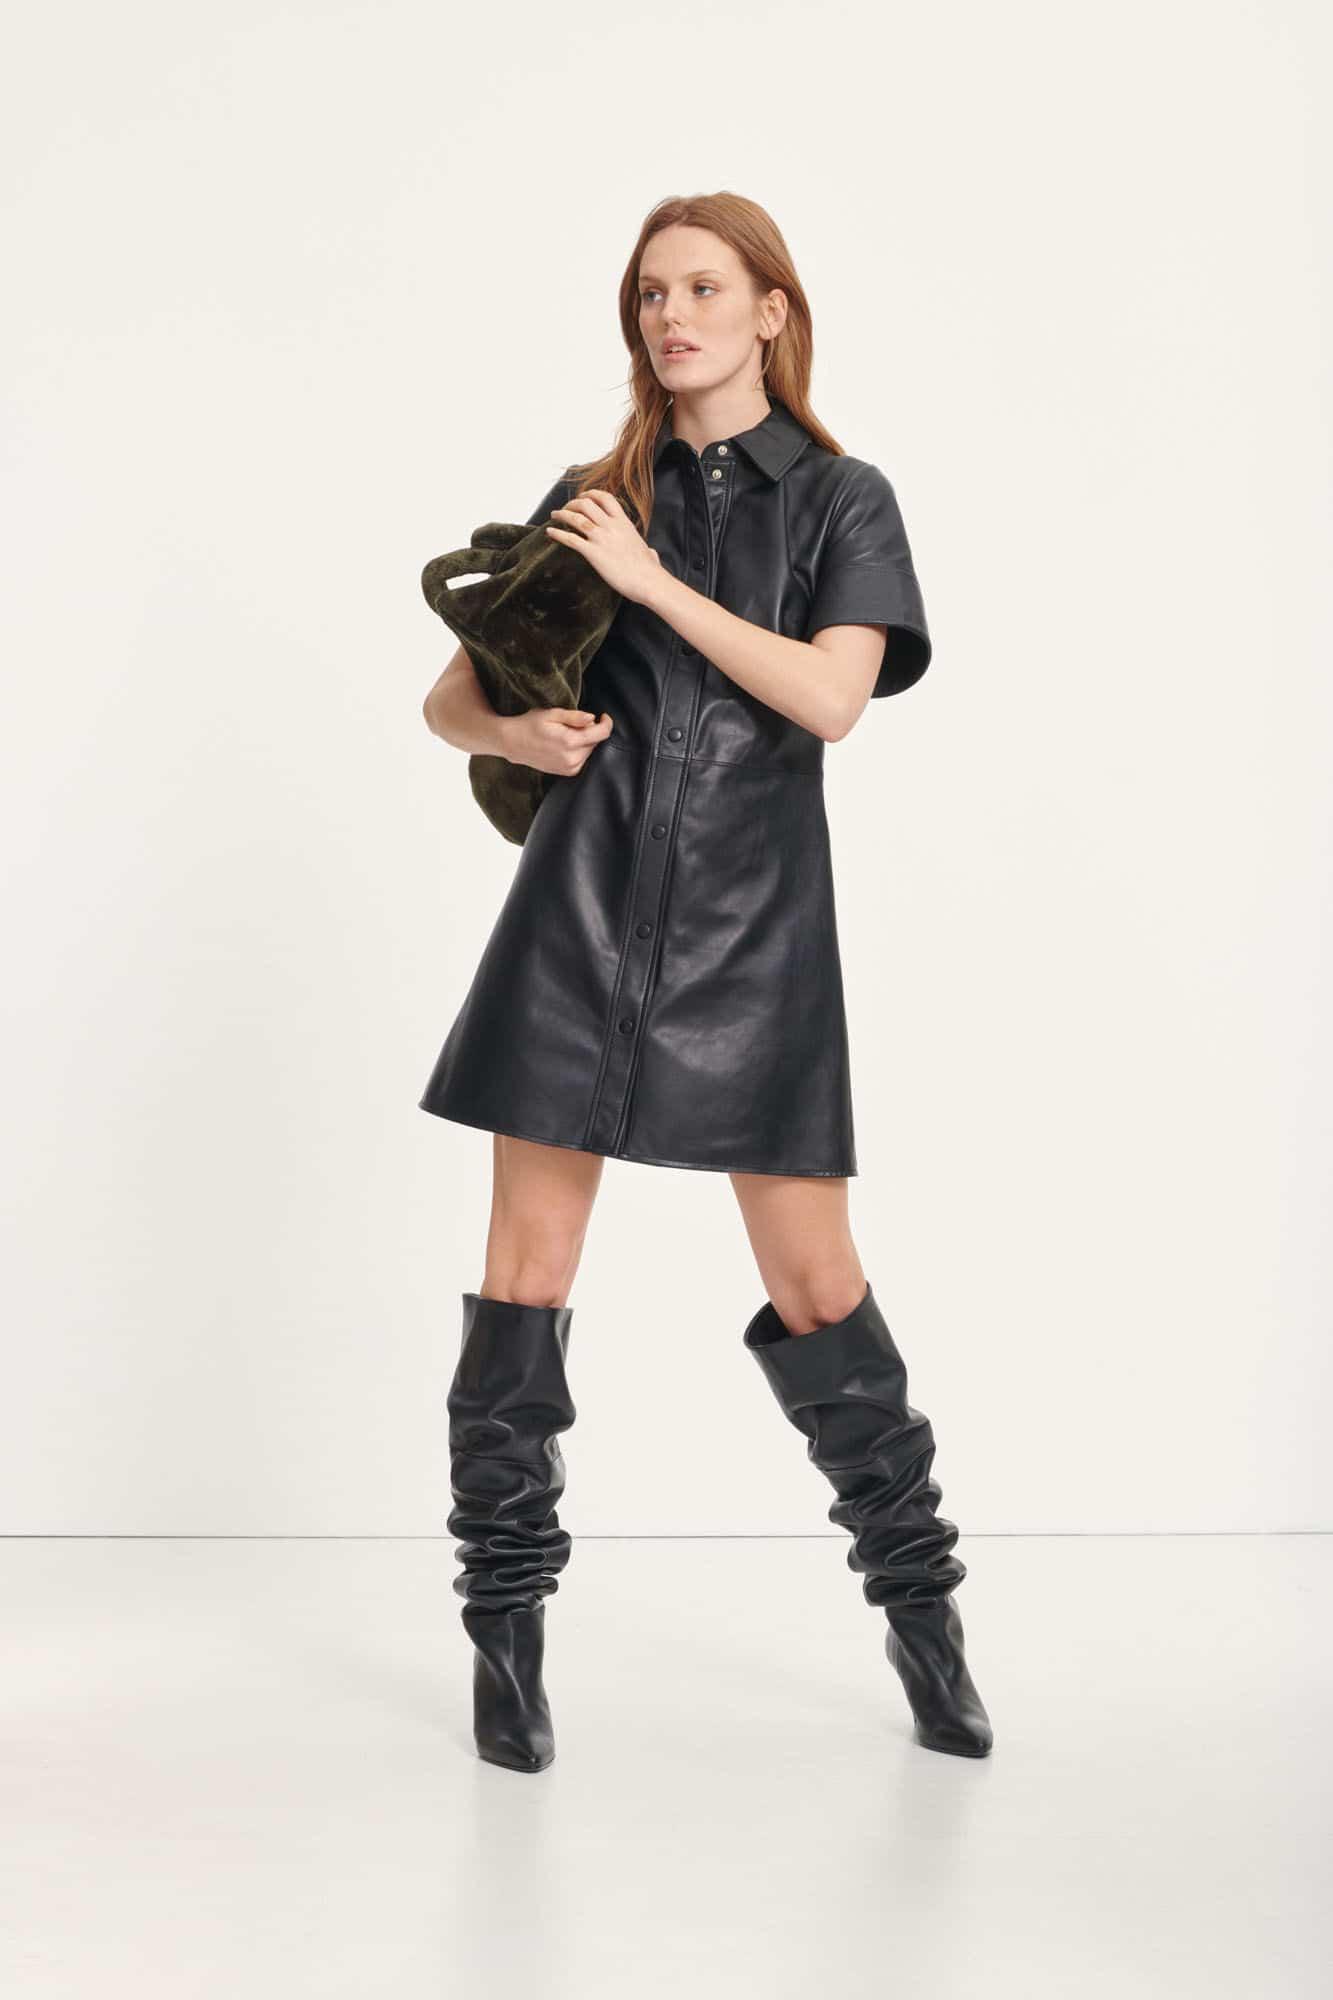 Model in black leather dress